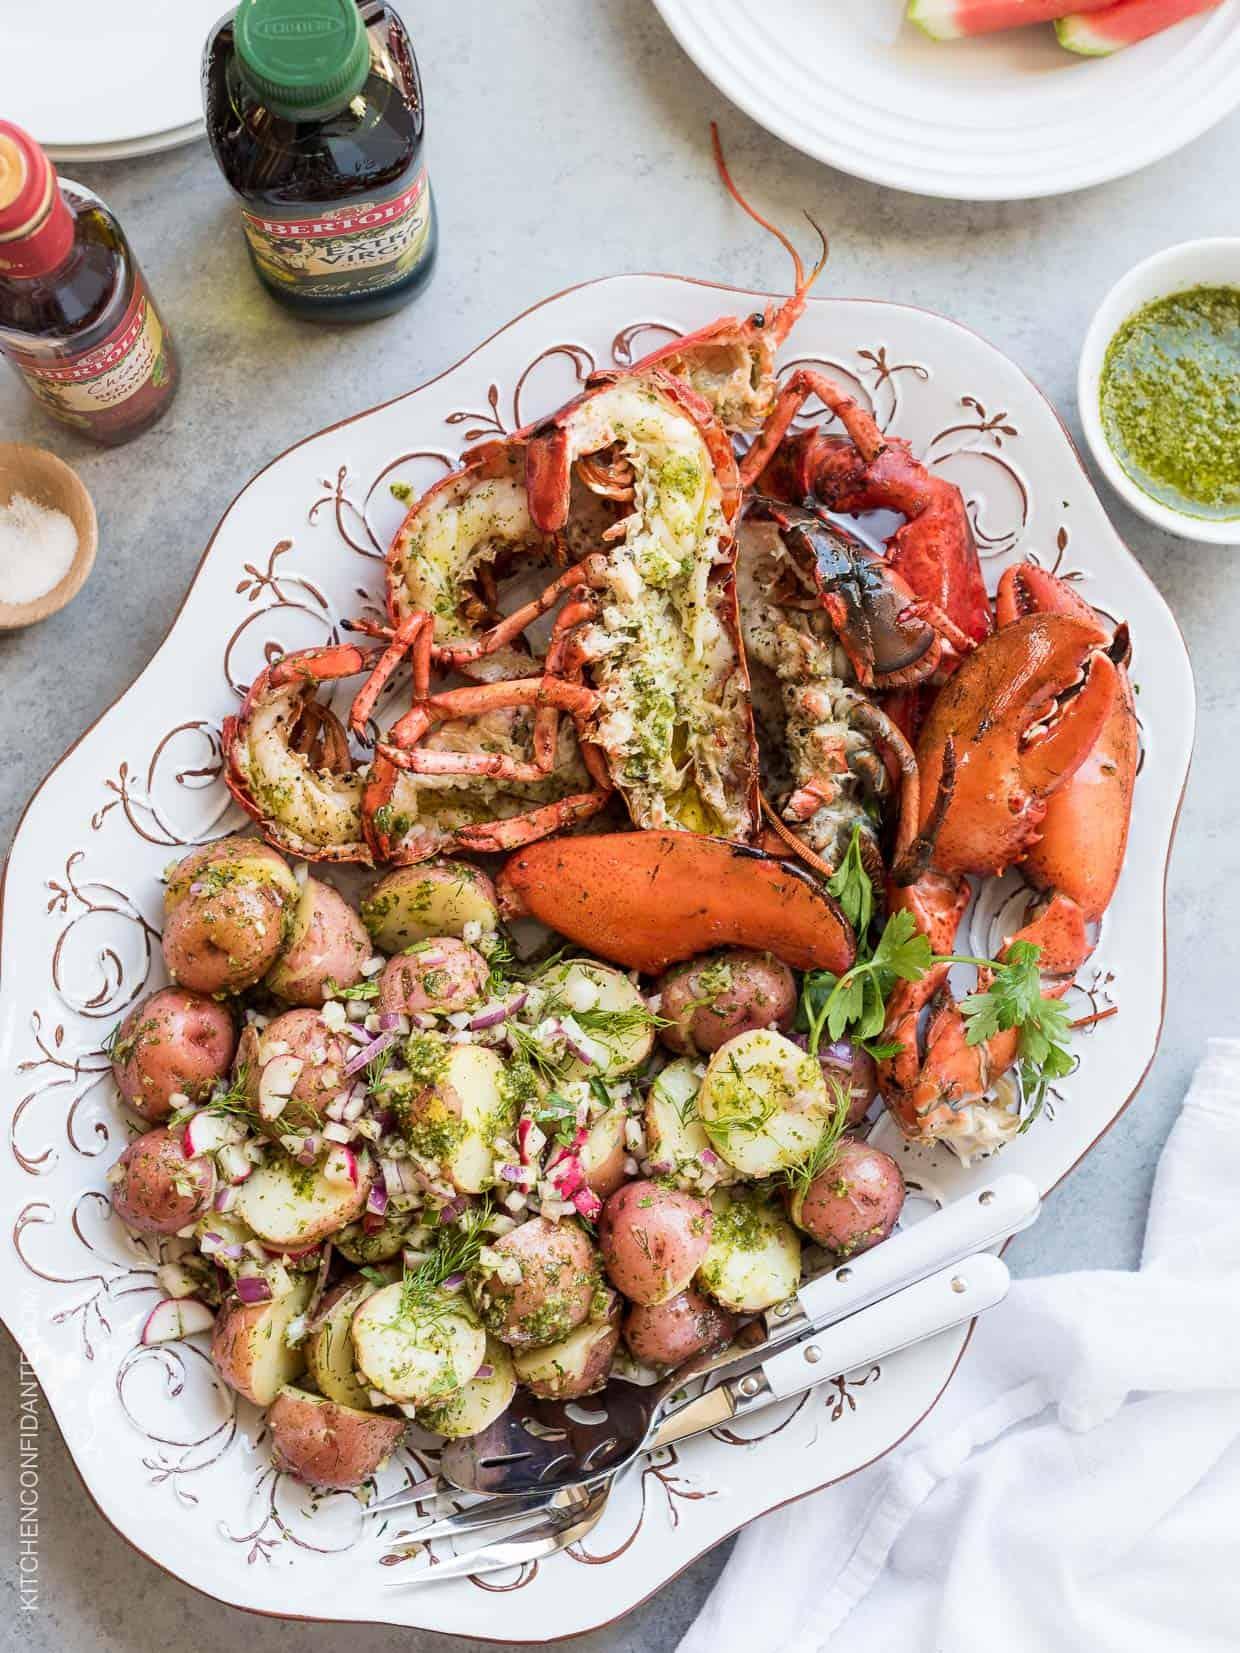 Grilled Chimichurri Lobster and Chimichurri Potato Salad